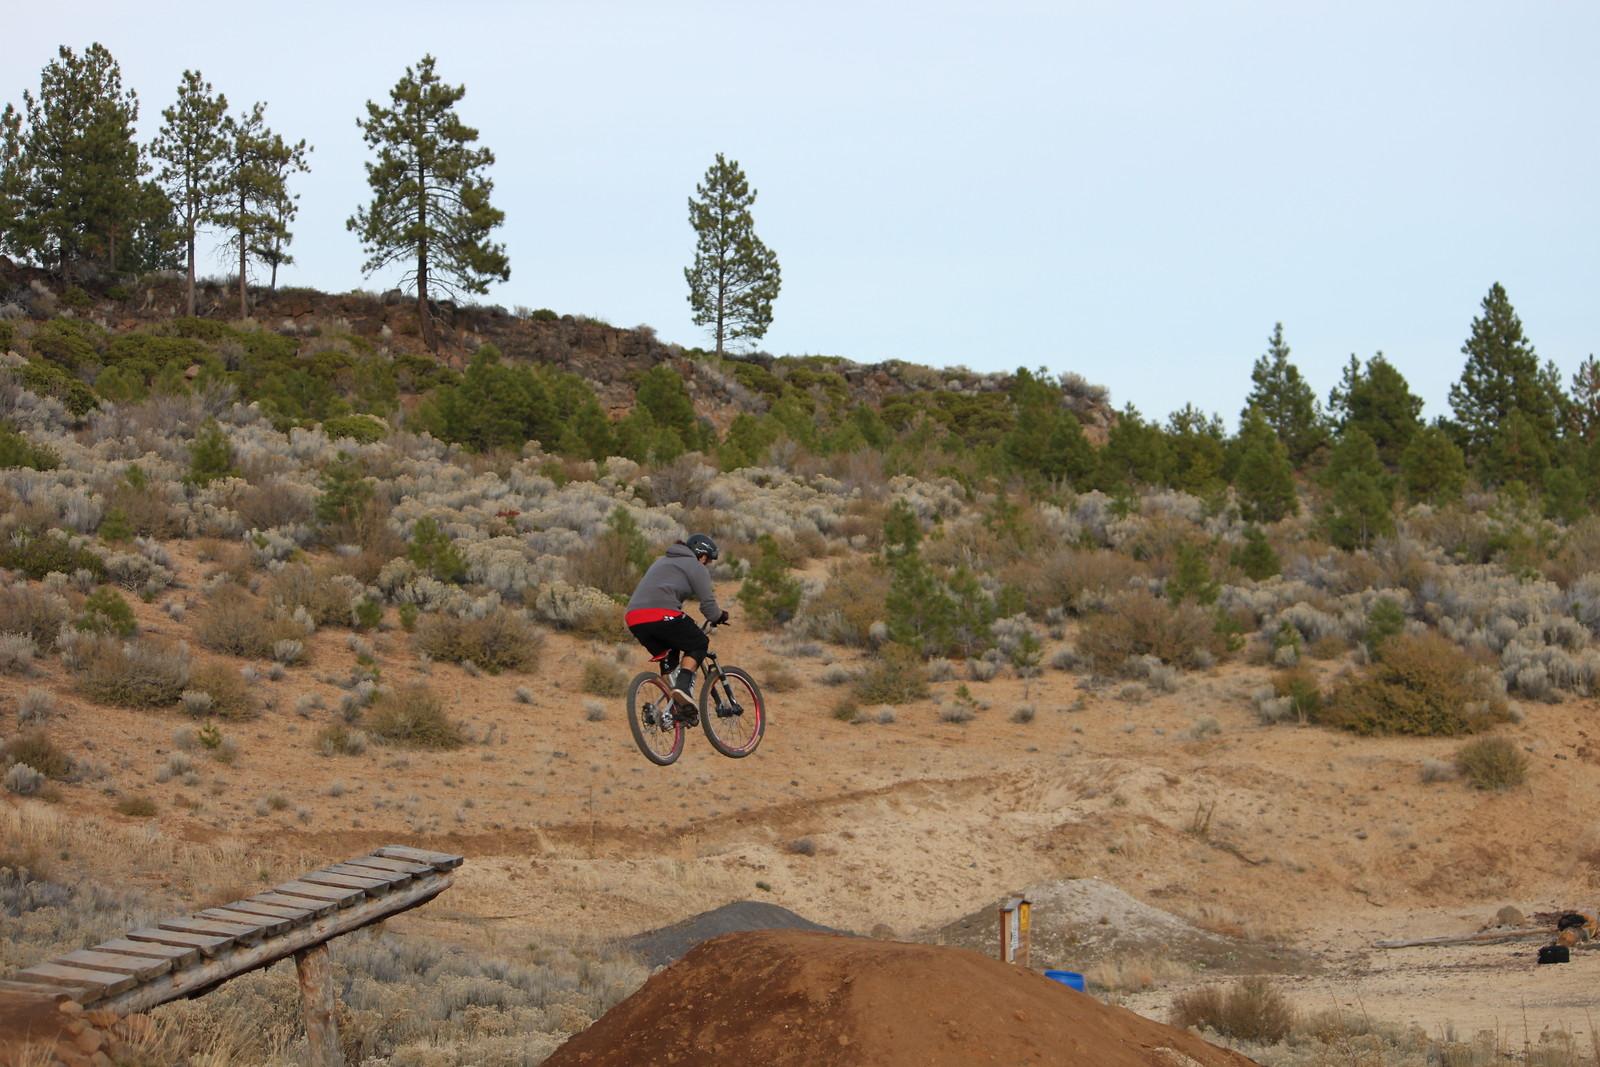 IMG 0223 - cannonball - Mountain Biking Pictures - Vital MTB